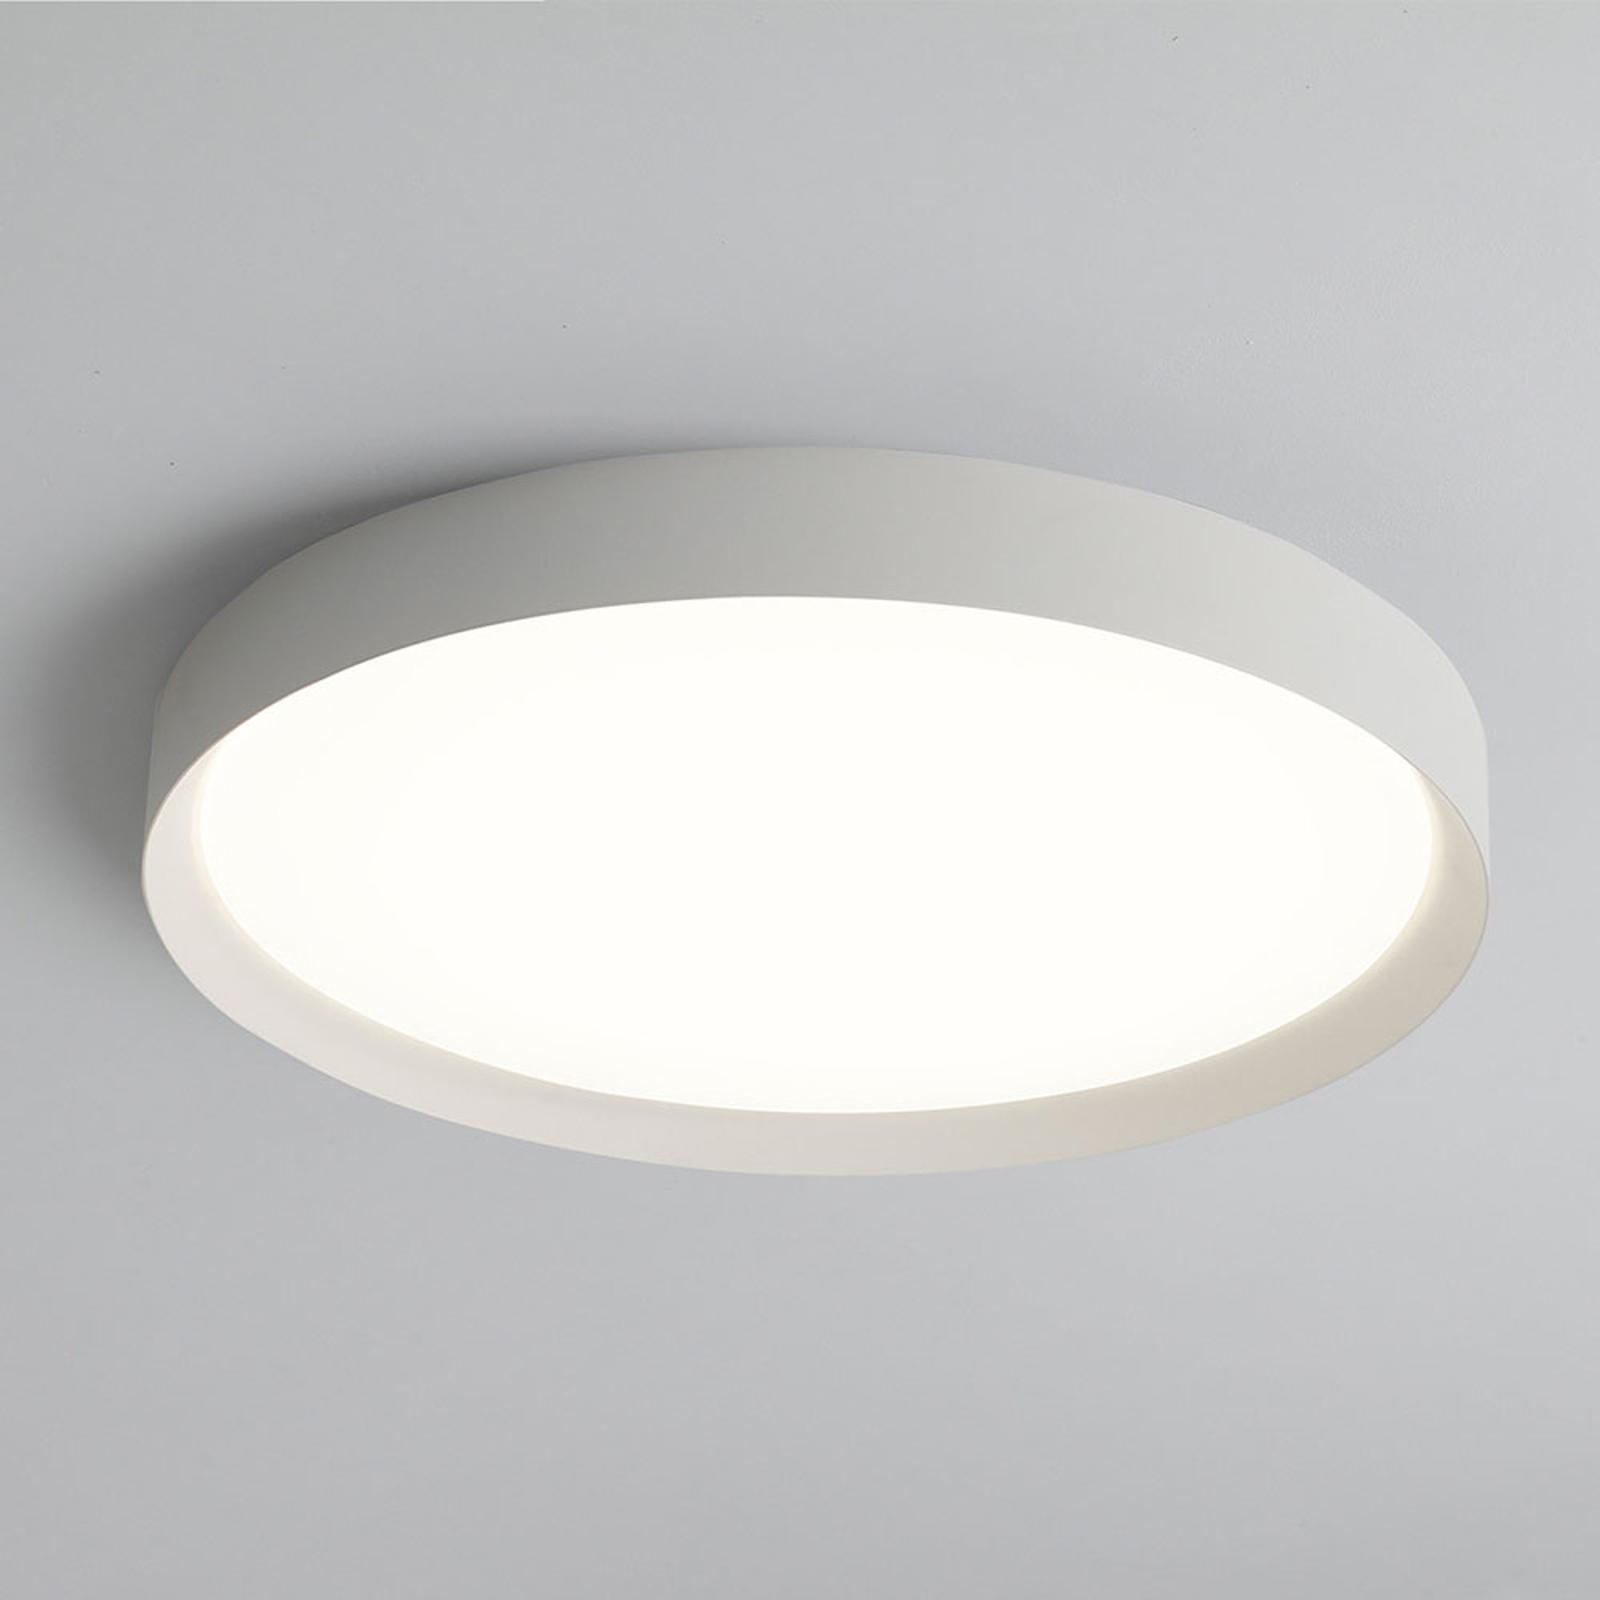 LED-Deckenlampe Minsk DALI Ø 60cm Casambi weiß